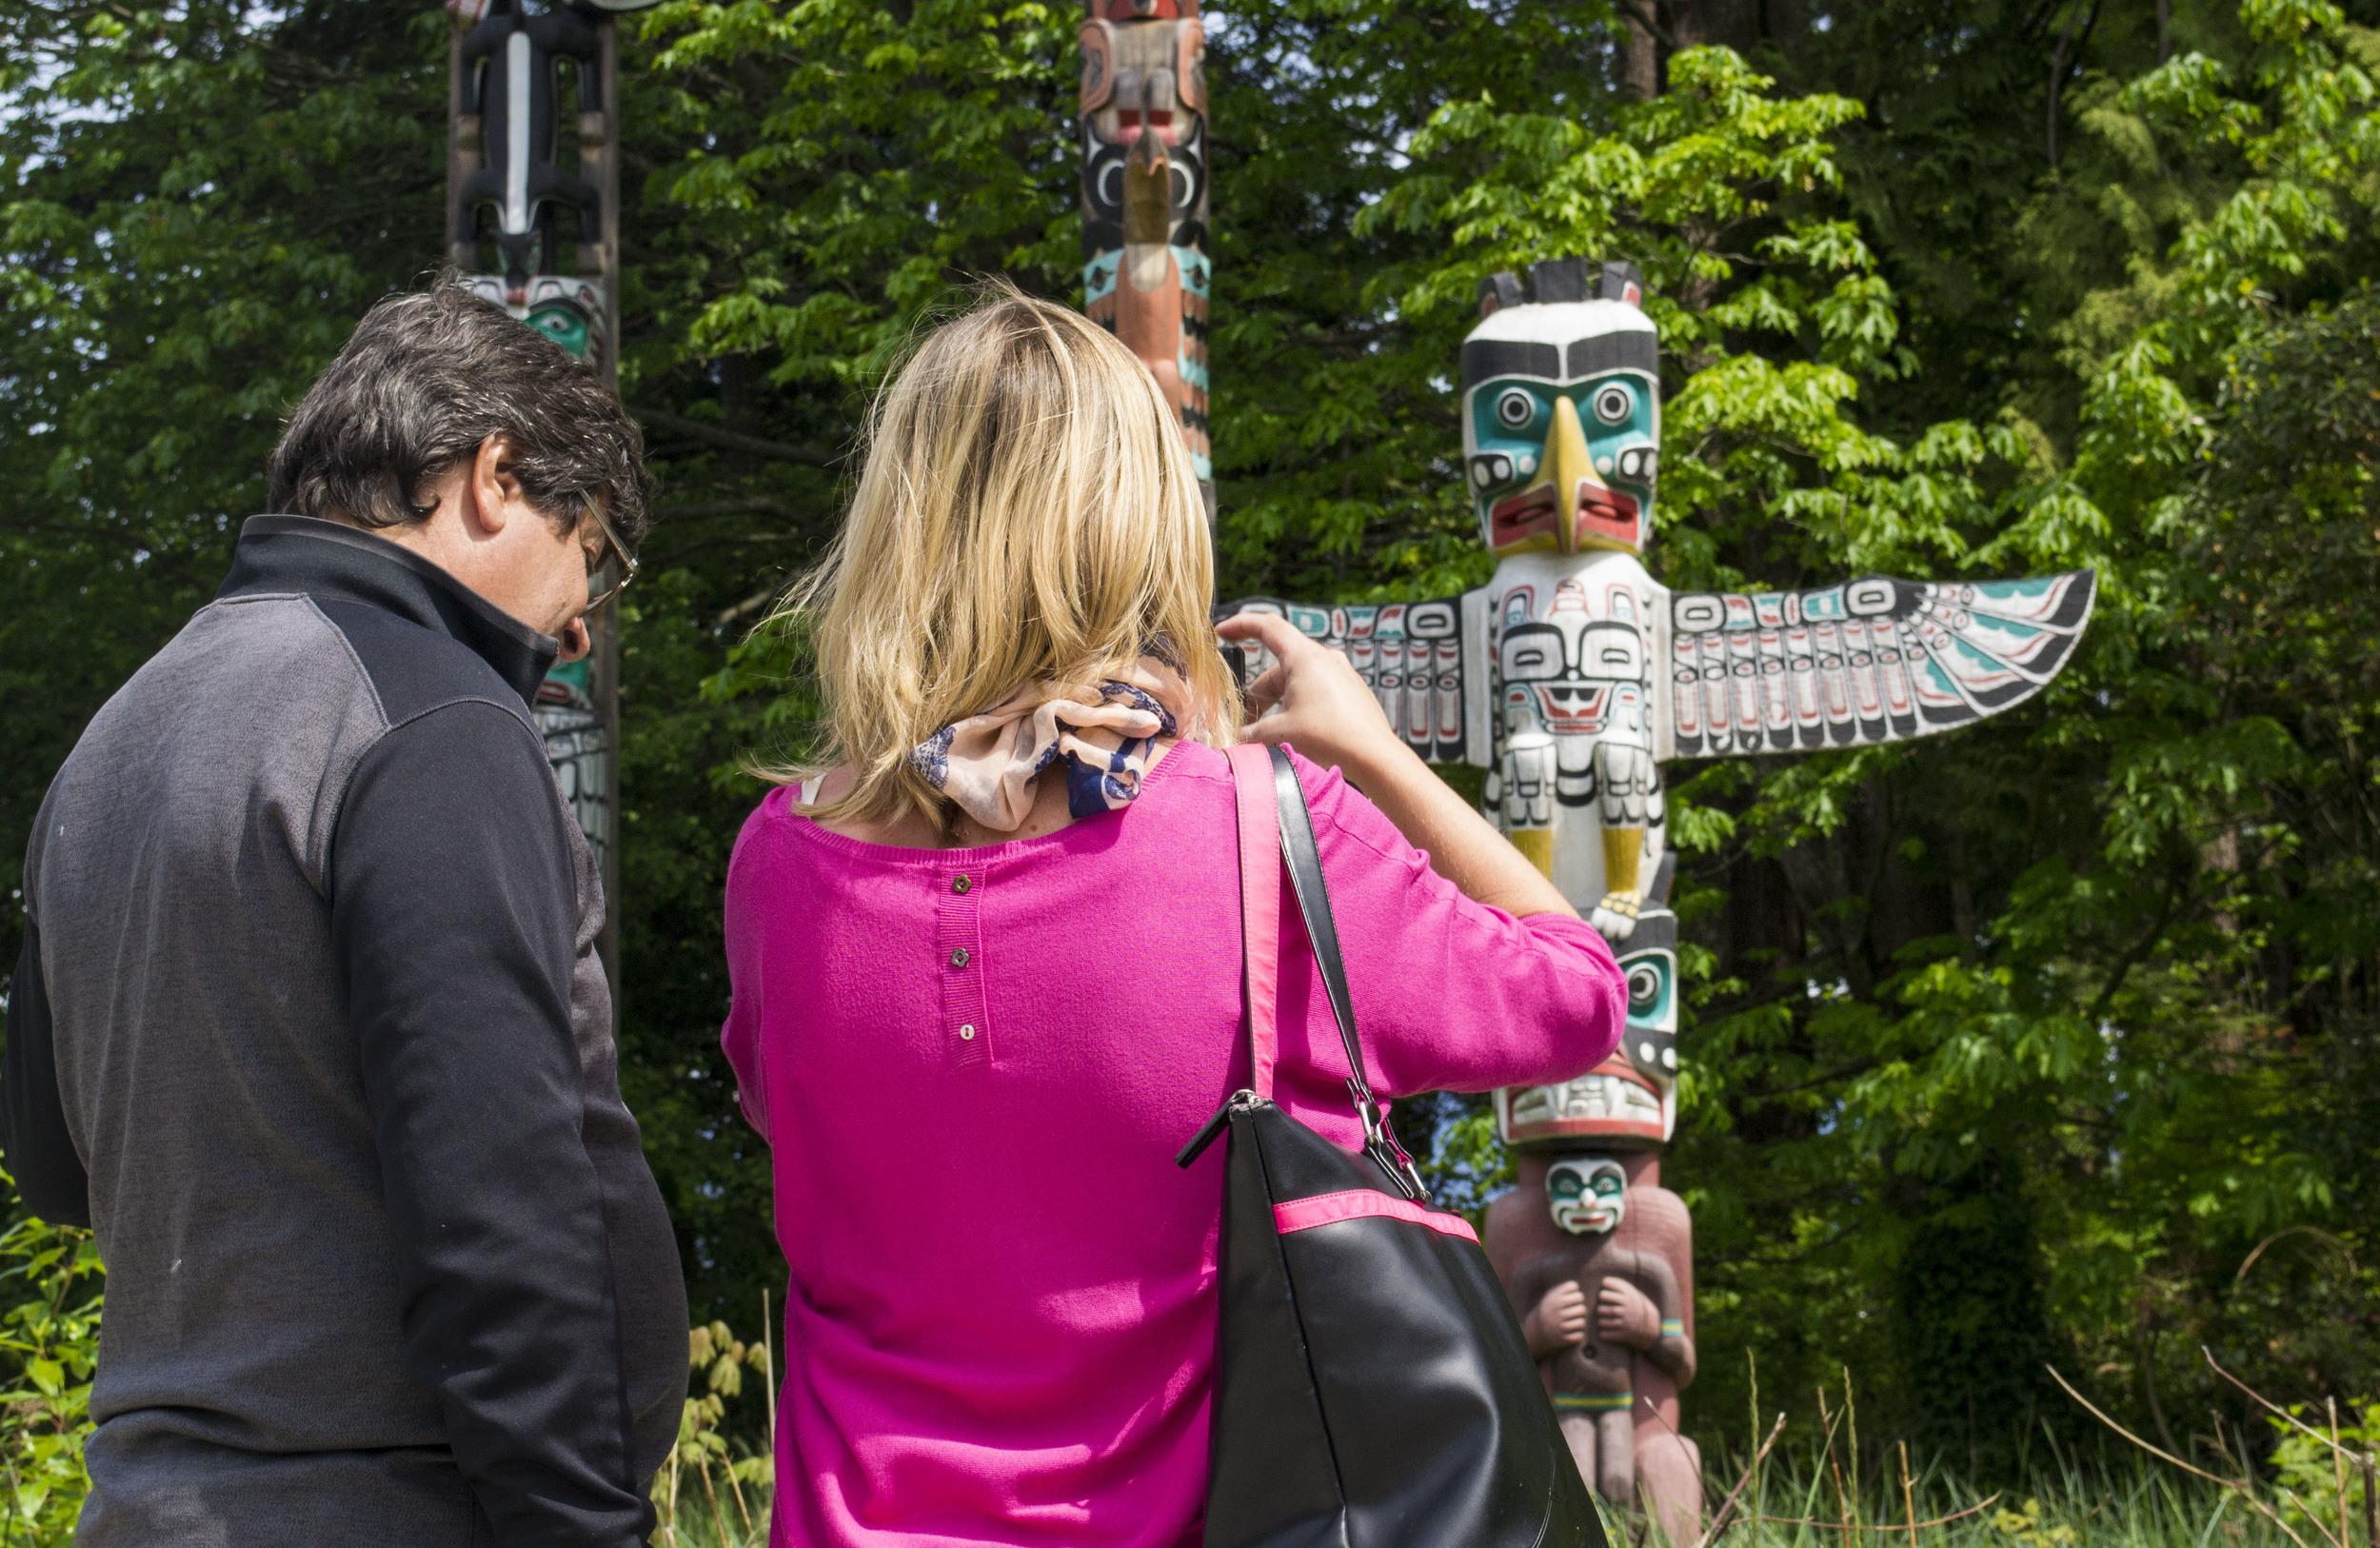 Stanley Park totem poles in Vancouver.